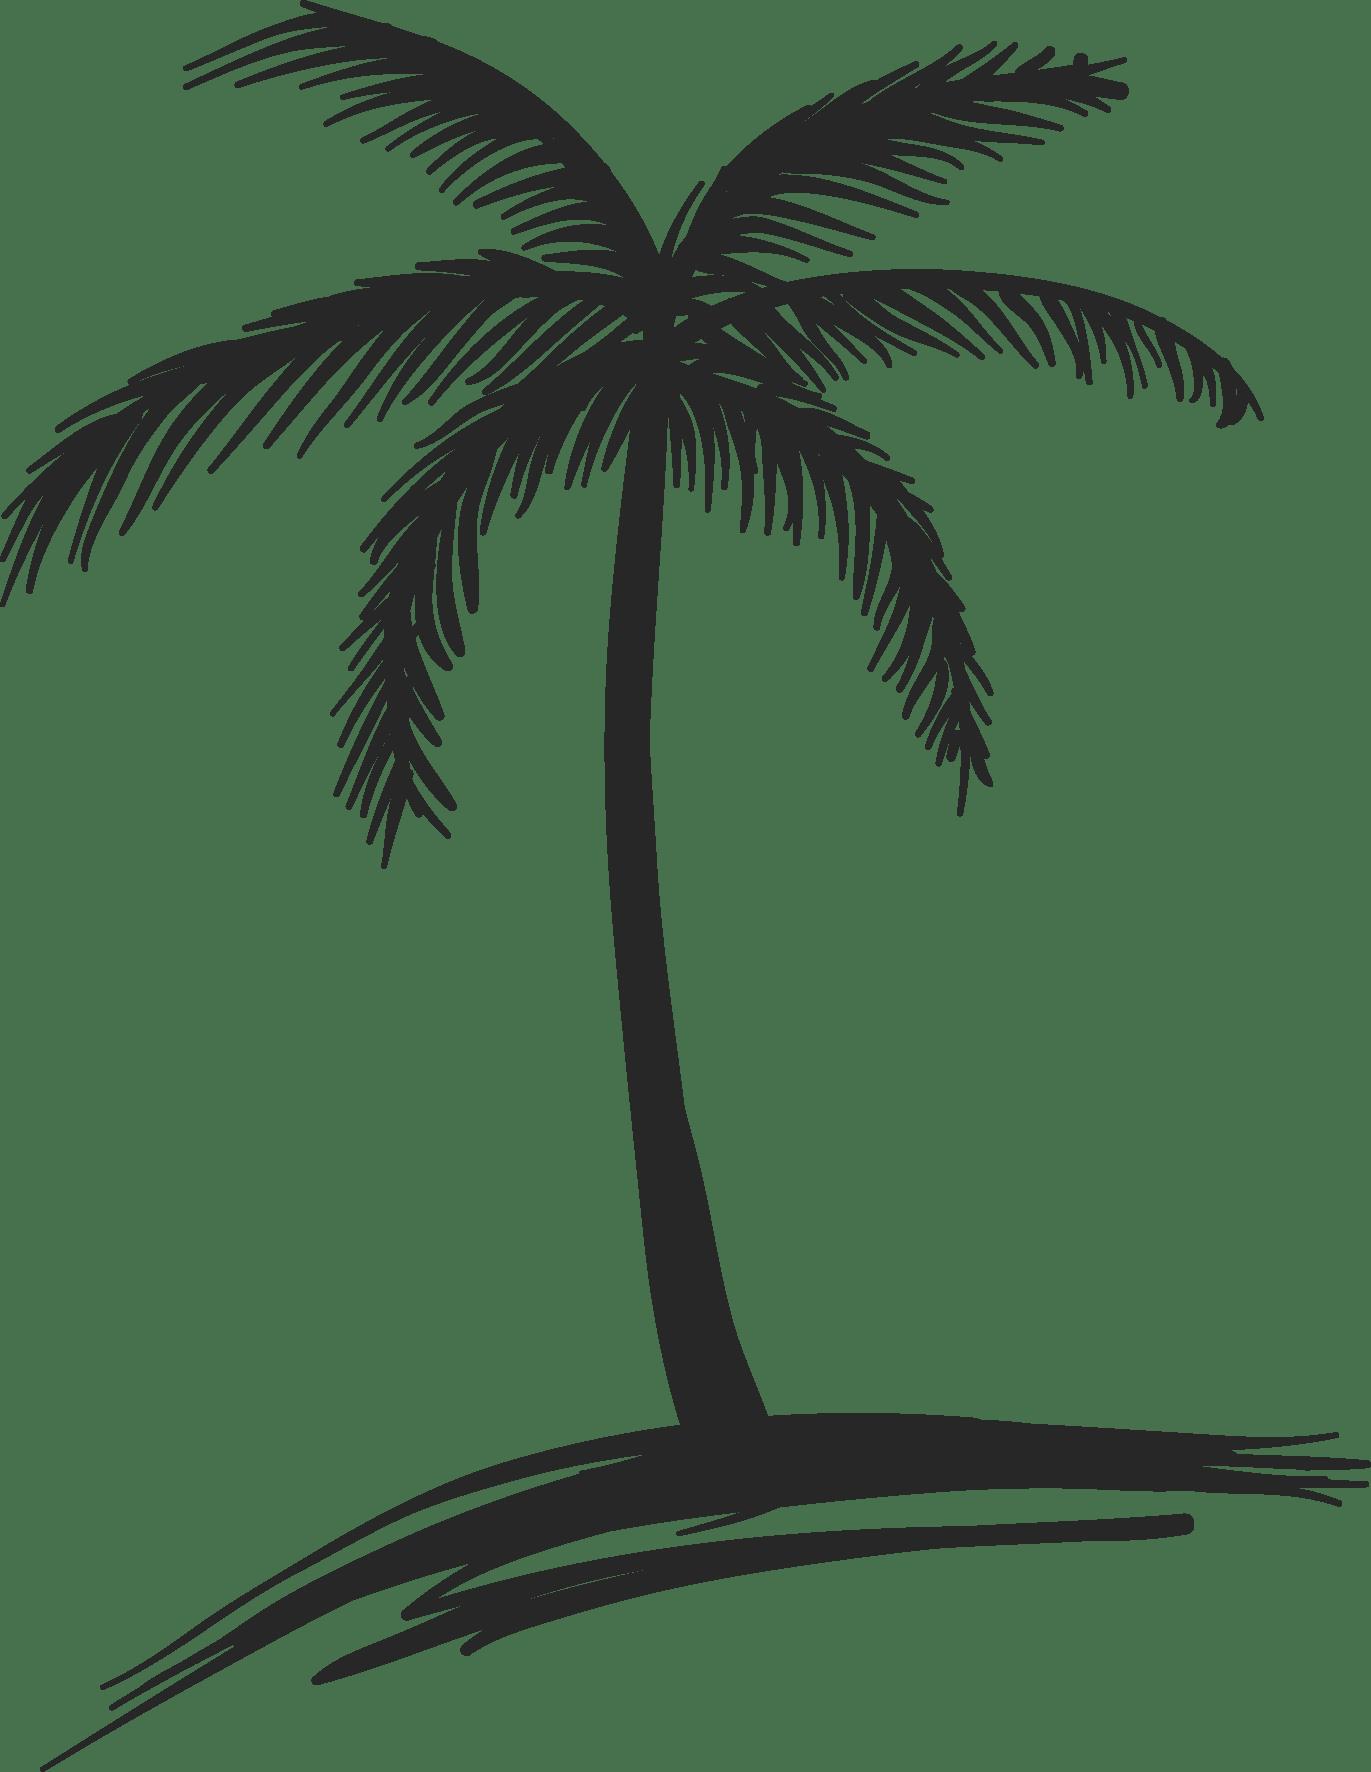 Palm Trees Drawings